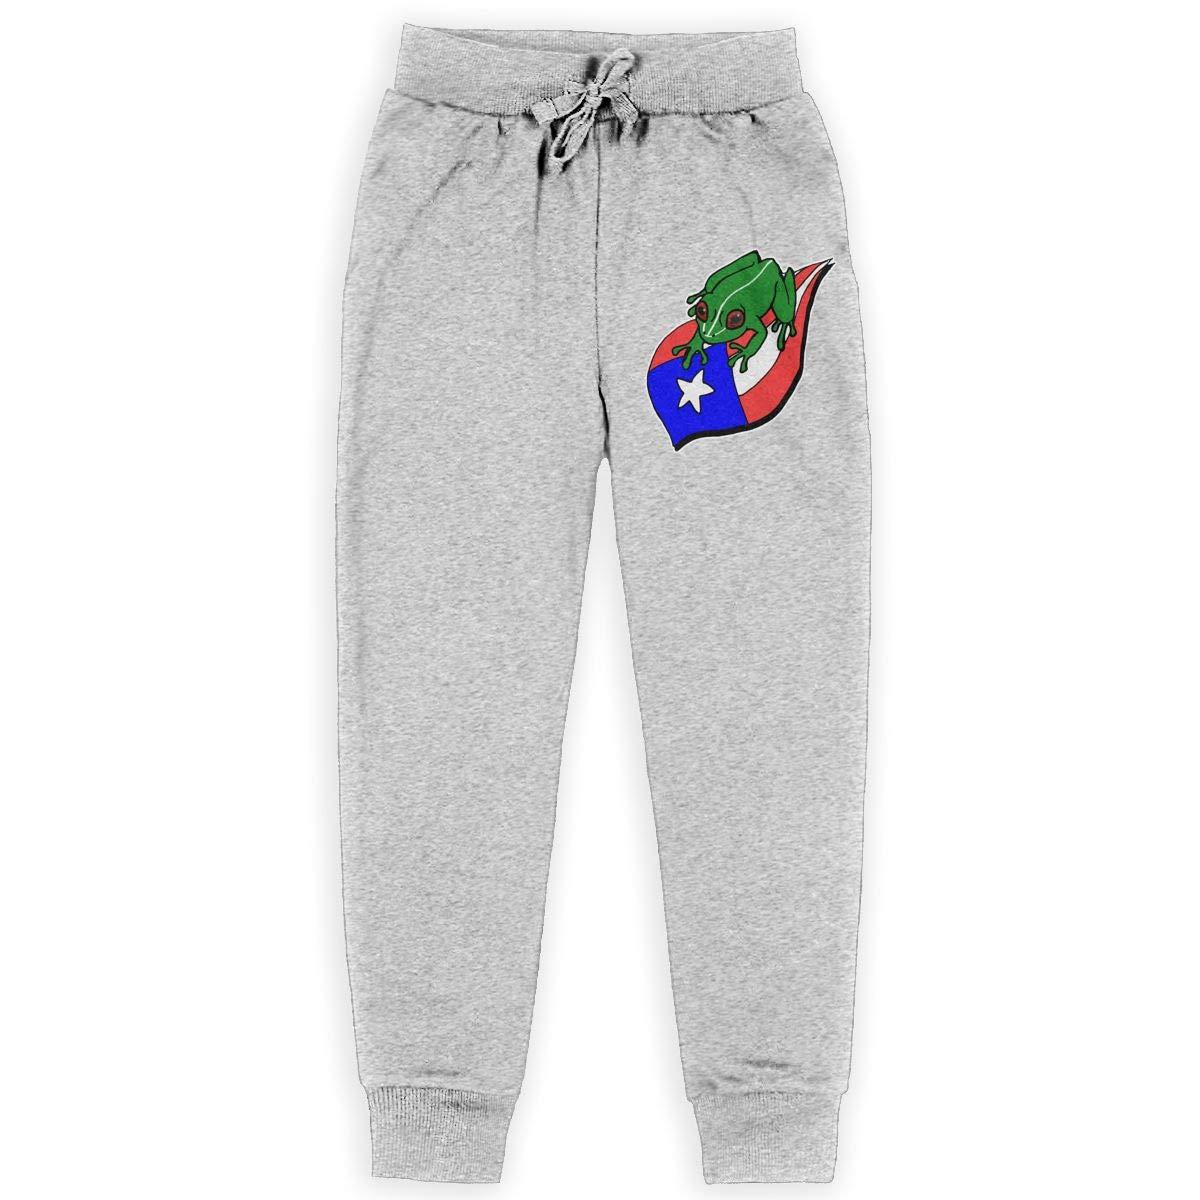 Puerto Rico Se Levanta Frog Teenagers Cotton Sweatpants Casual Joggers Pants Active Pants